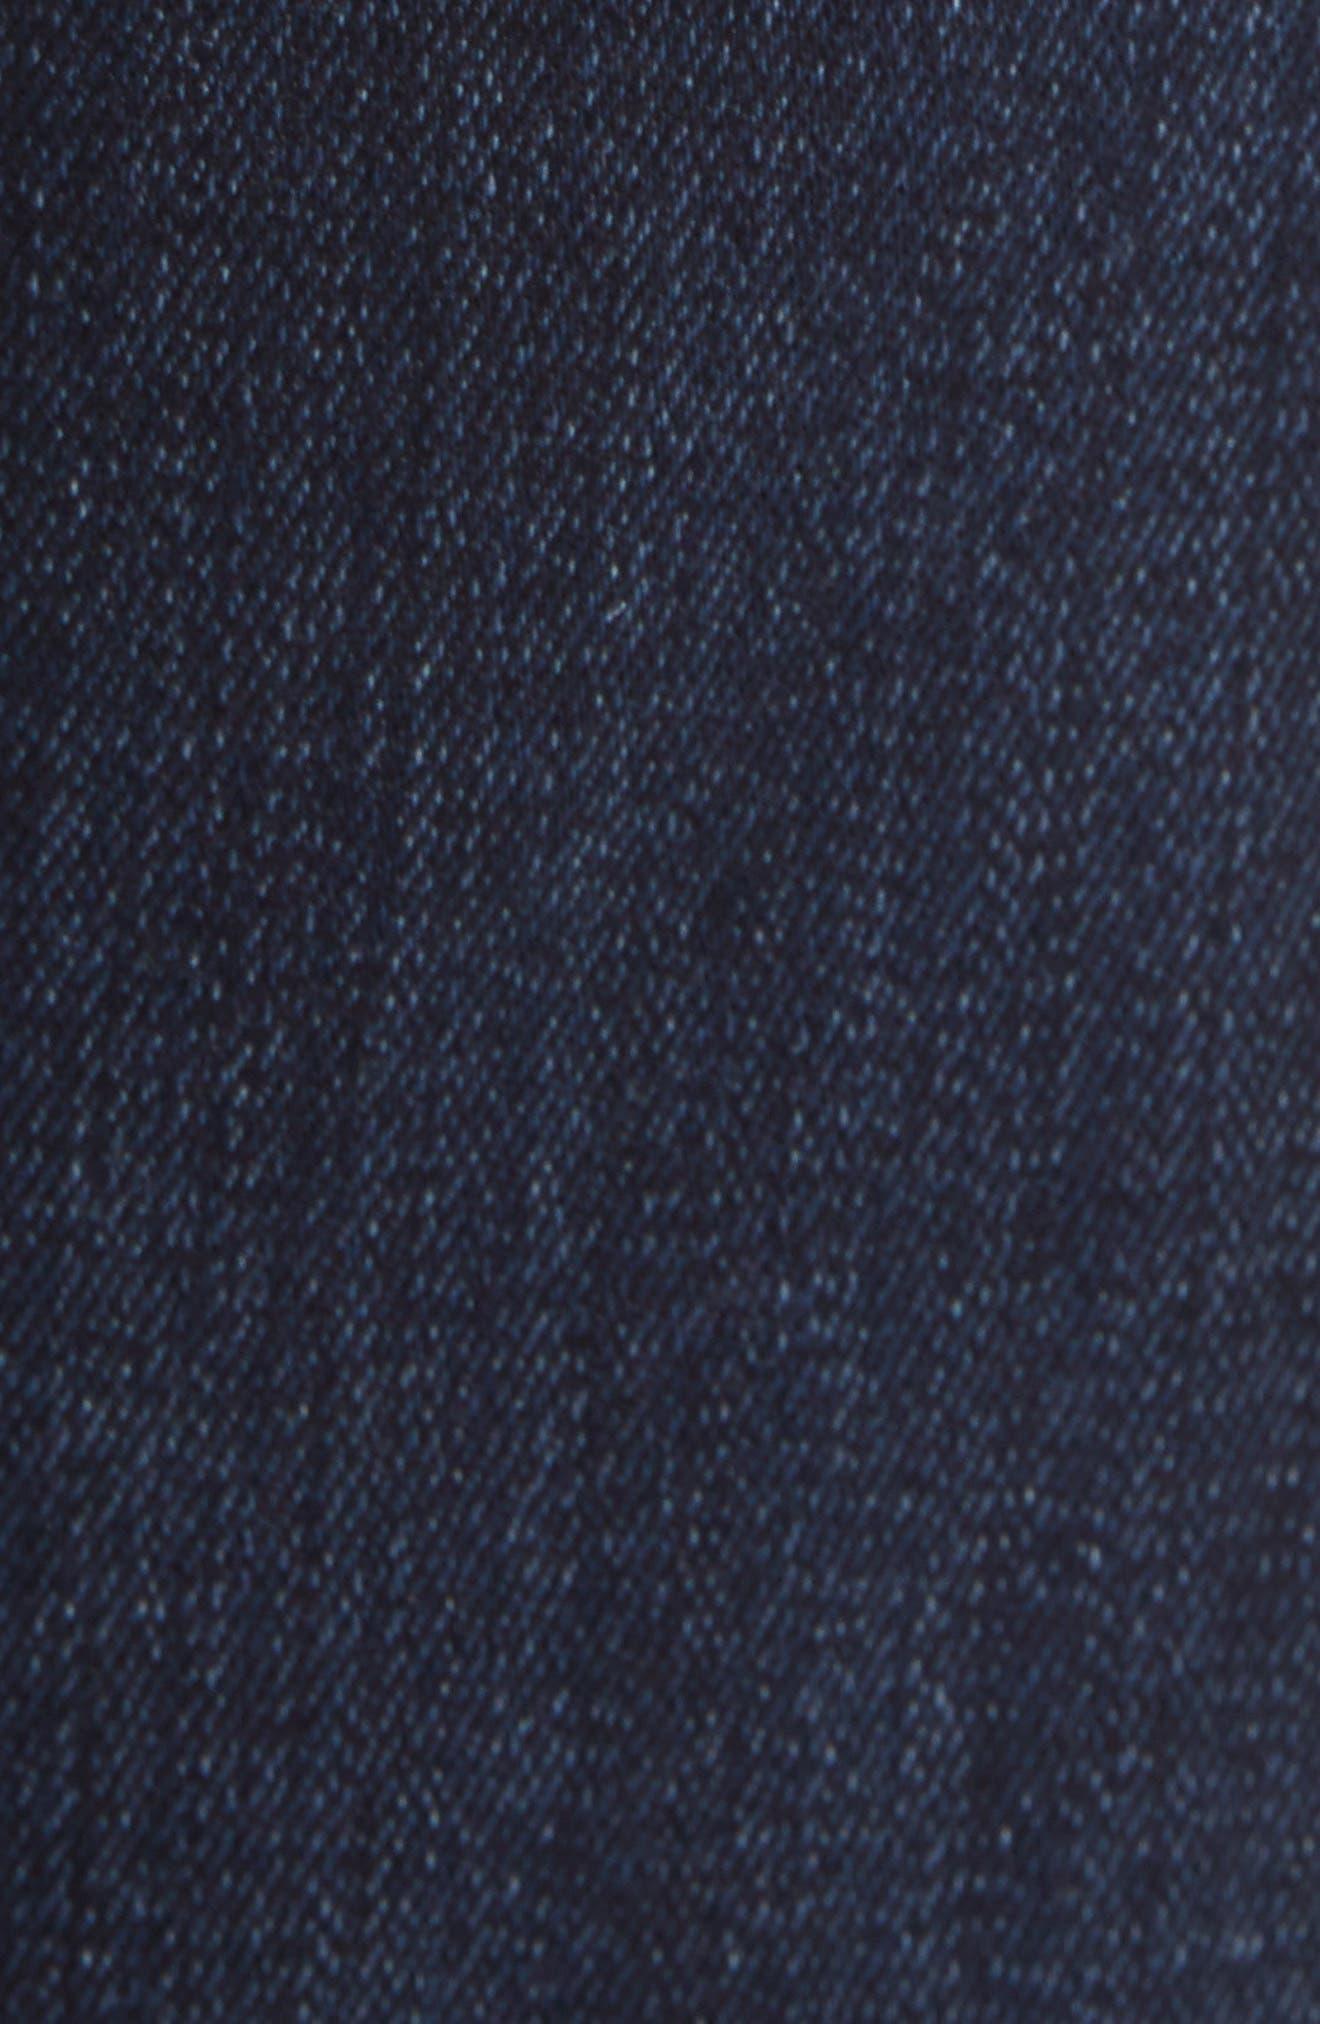 Matt Relaxed Fit Jeans,                             Alternate thumbnail 5, color,                             DEEP CAPITOL HILL